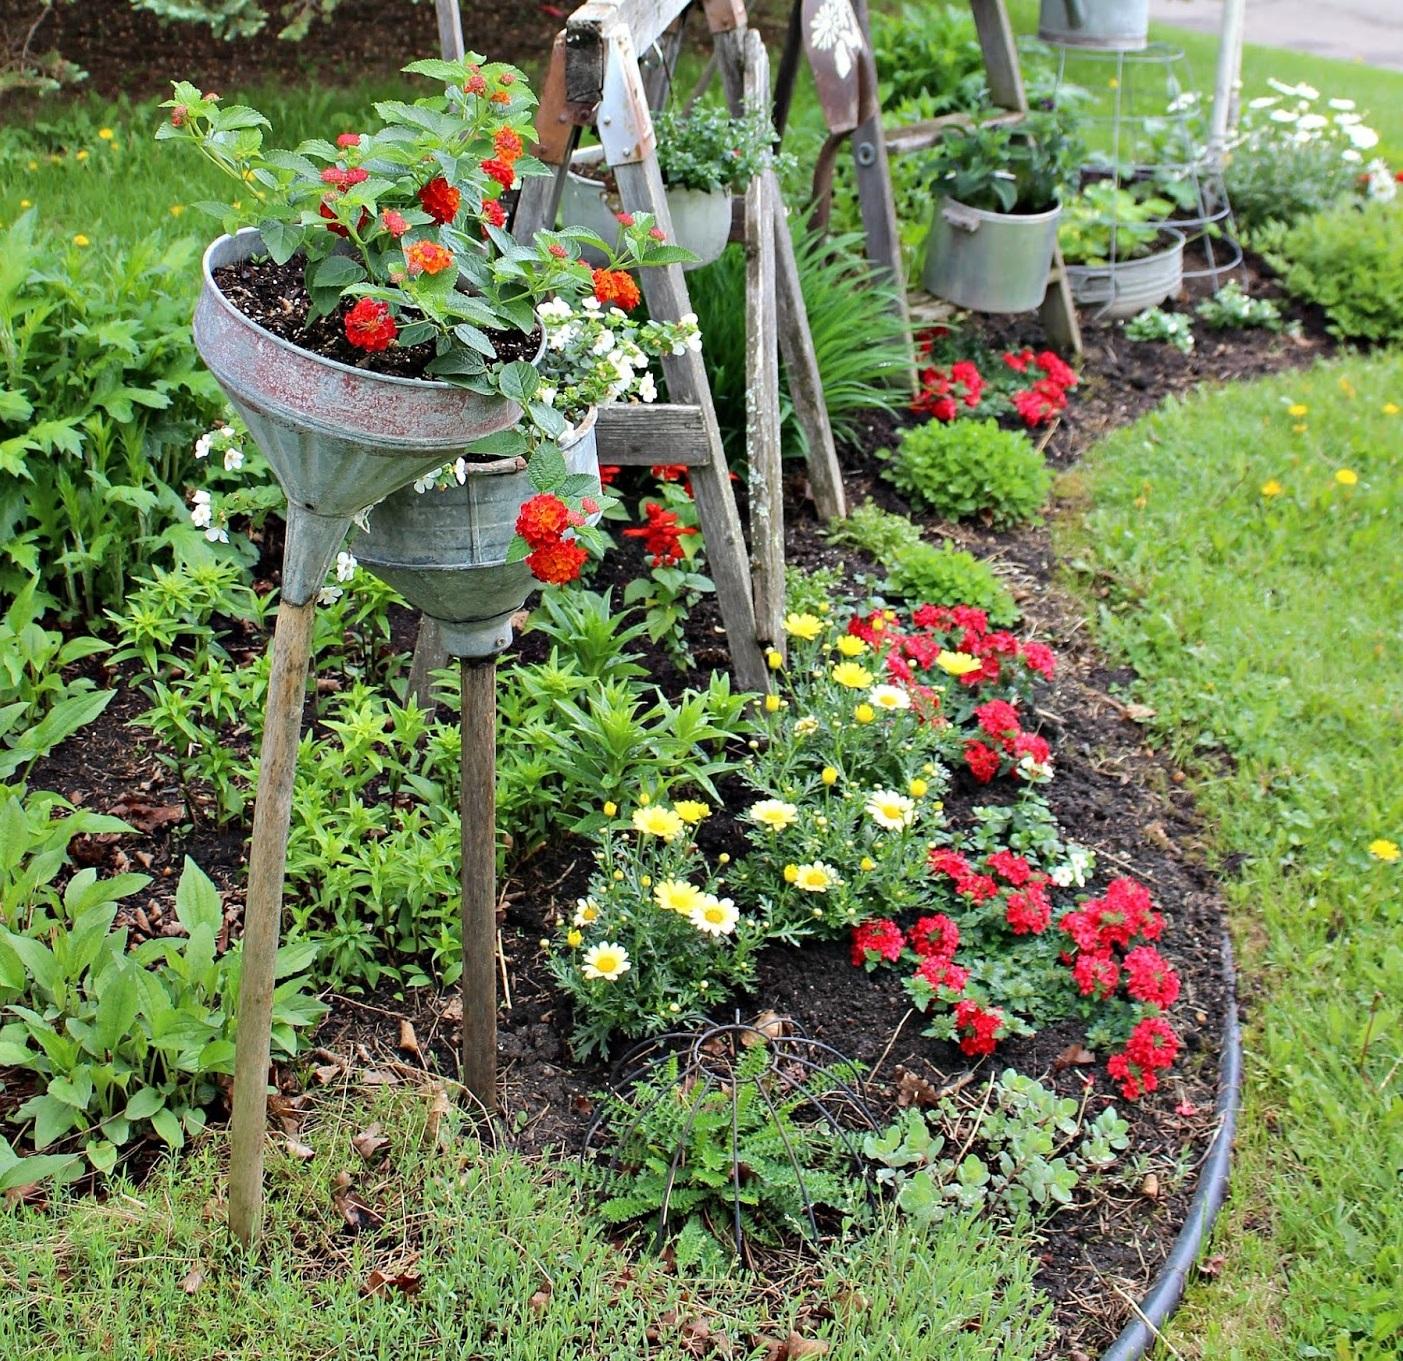 garden-ornament.-2 100+ Surprising Garden Design Ideas You Should Not Miss in 2021